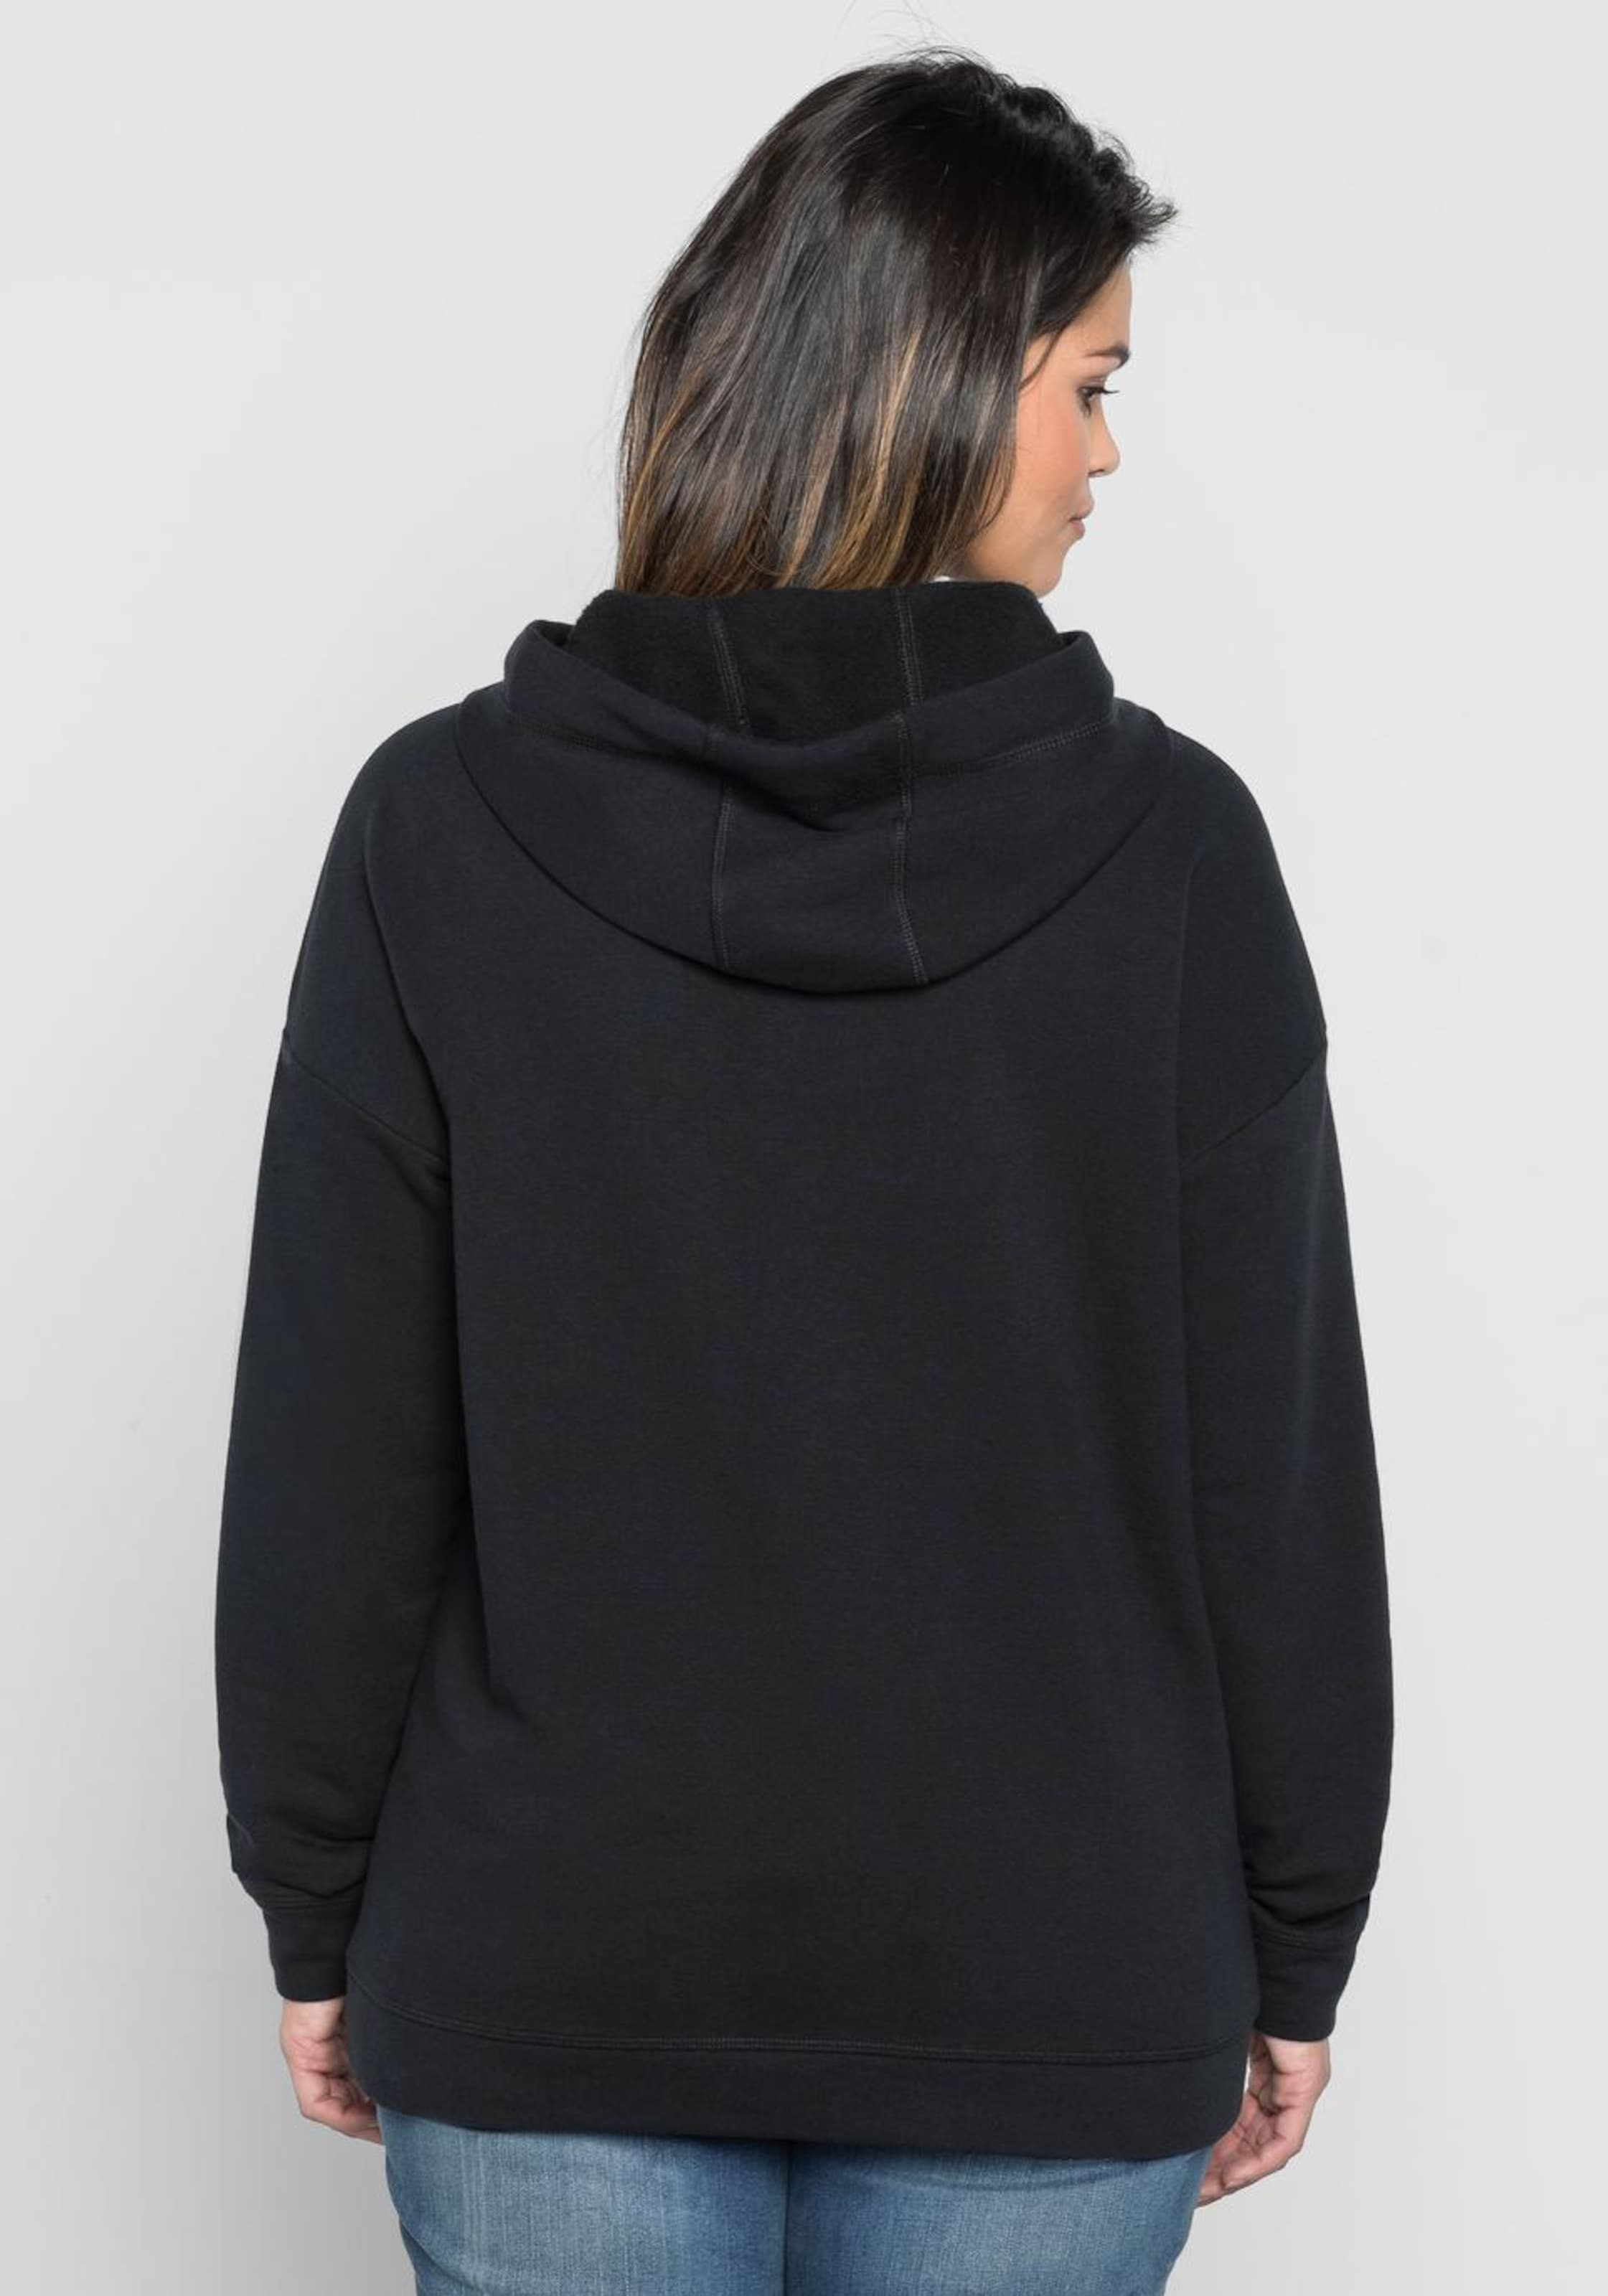 Sweatshirt In Schwarz Schwarz Sheego In Sweatshirt In Schwarz Sweatshirt Sheego Sweatshirt In Sheego Sheego ybvIf6mY7g